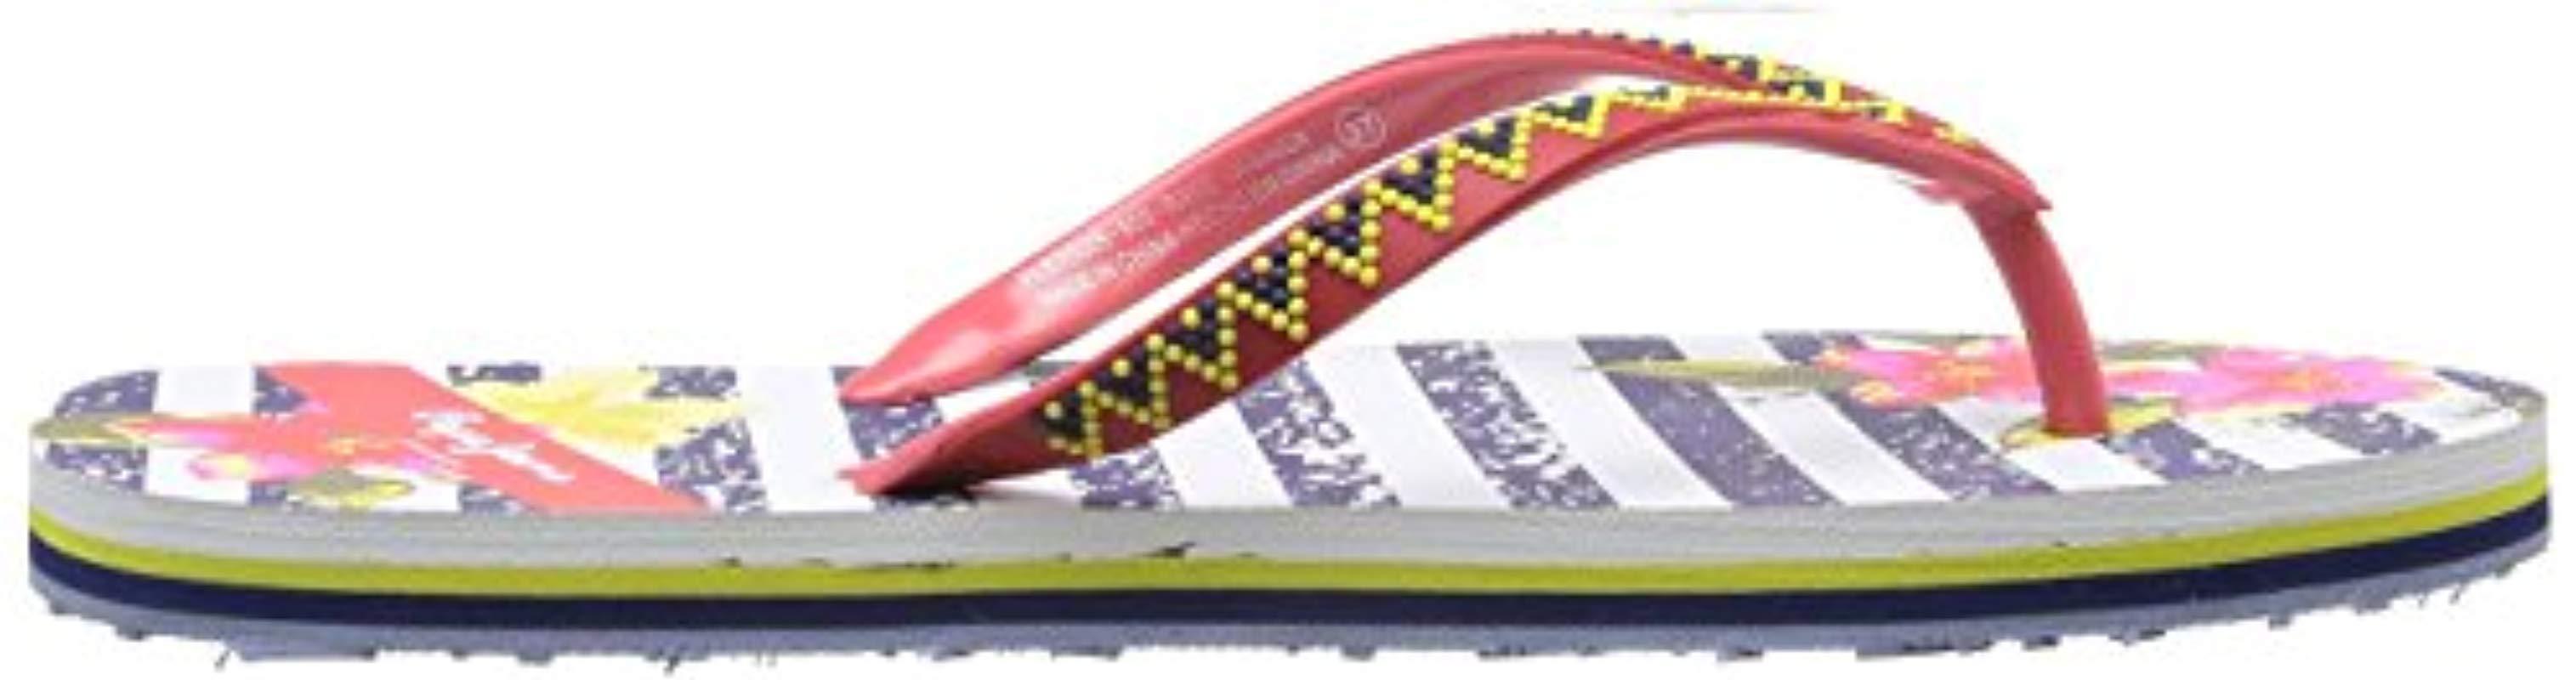 London RAKE Jamaica - Sandalias de Goma para Mujer Pepe Jeans de Denim